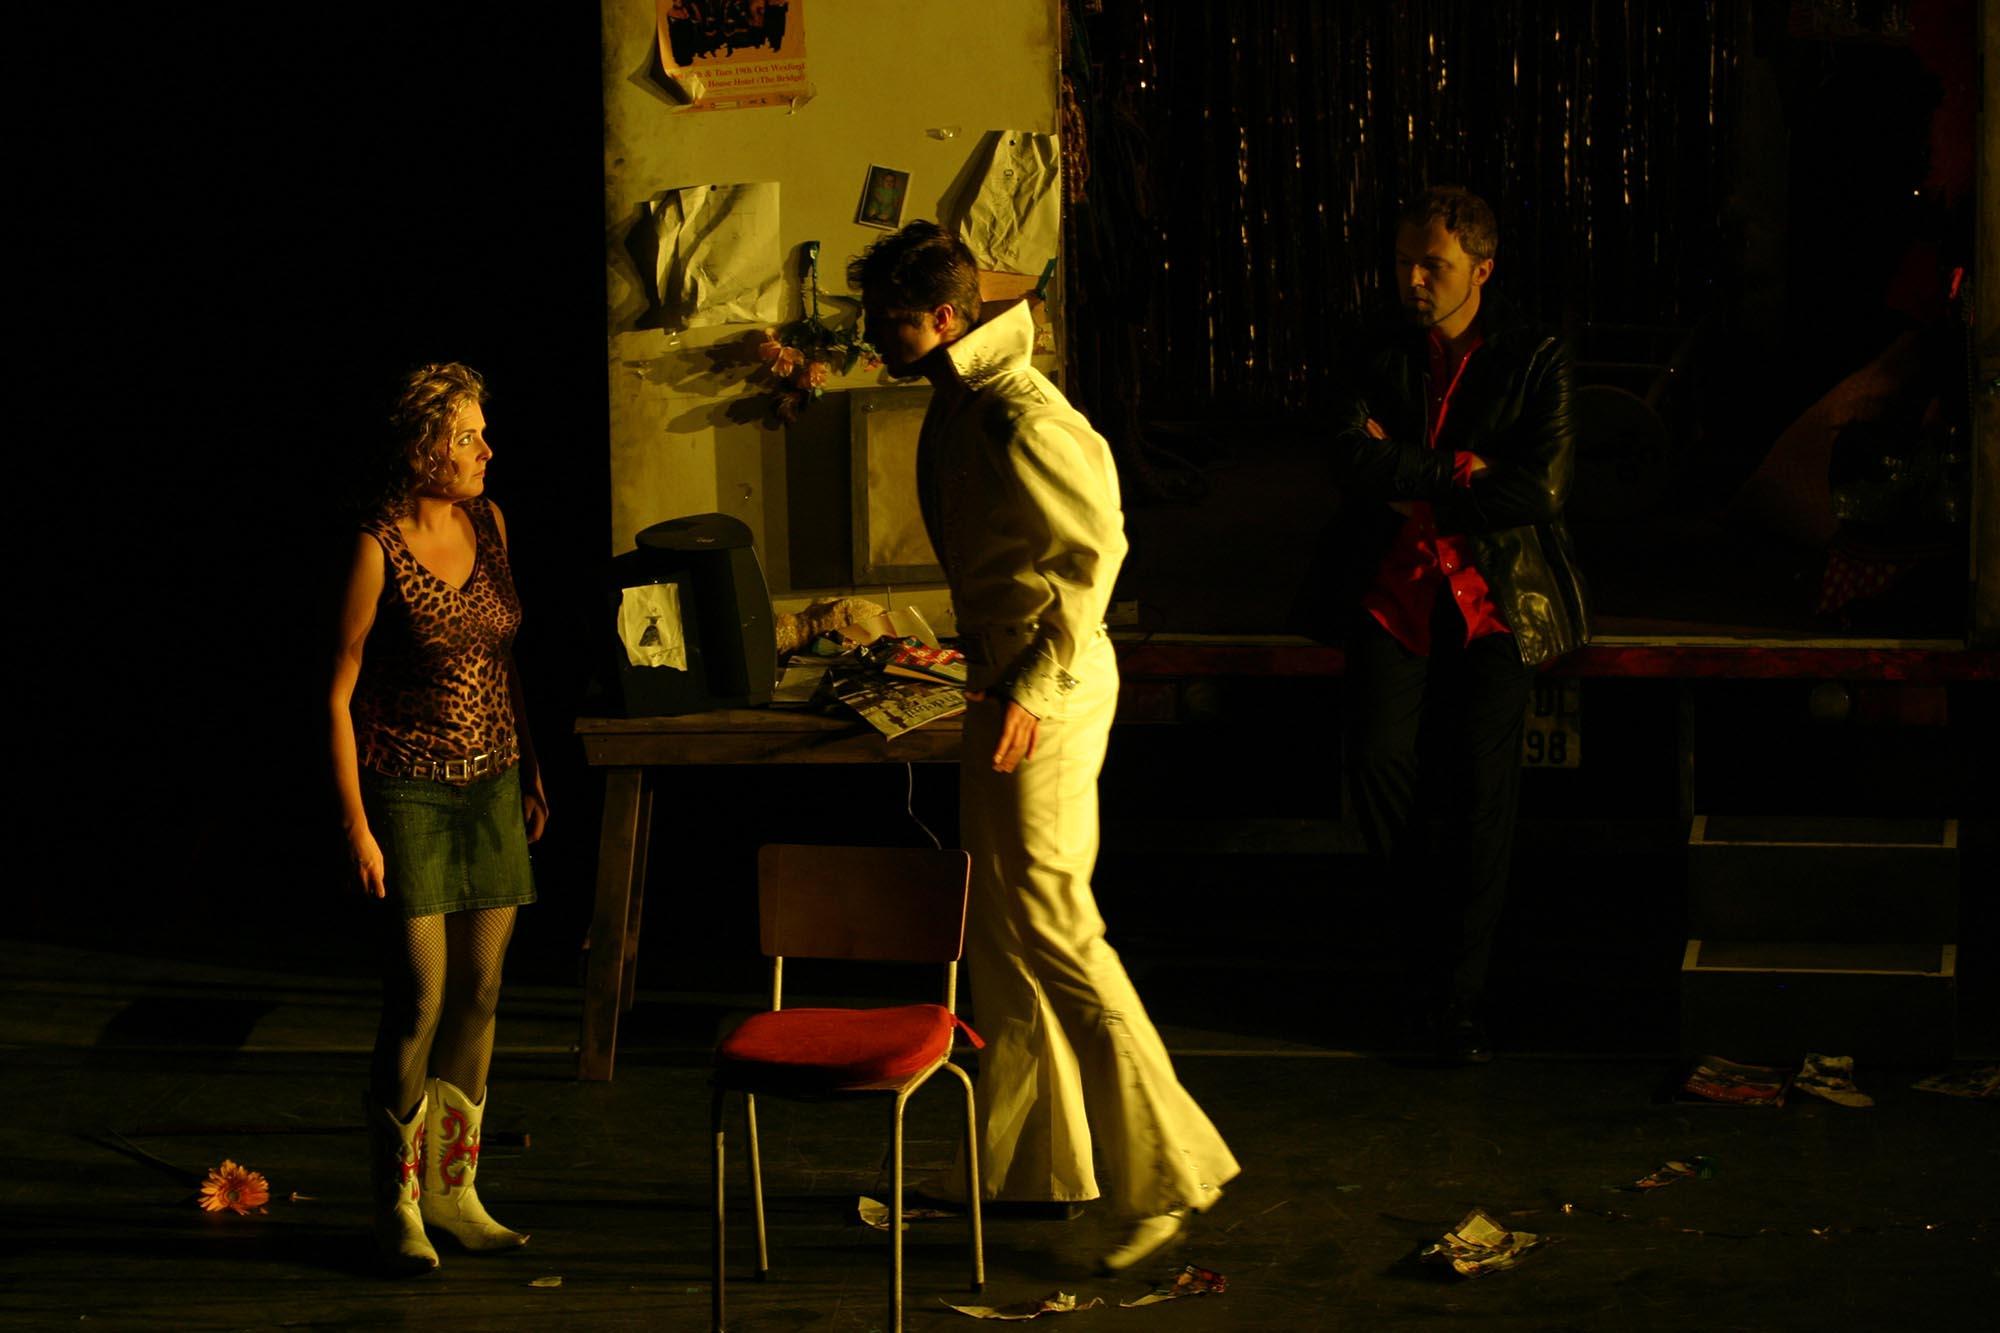 Pagliacci-Opera-Stage-Director-Jacopo-Spirei-5